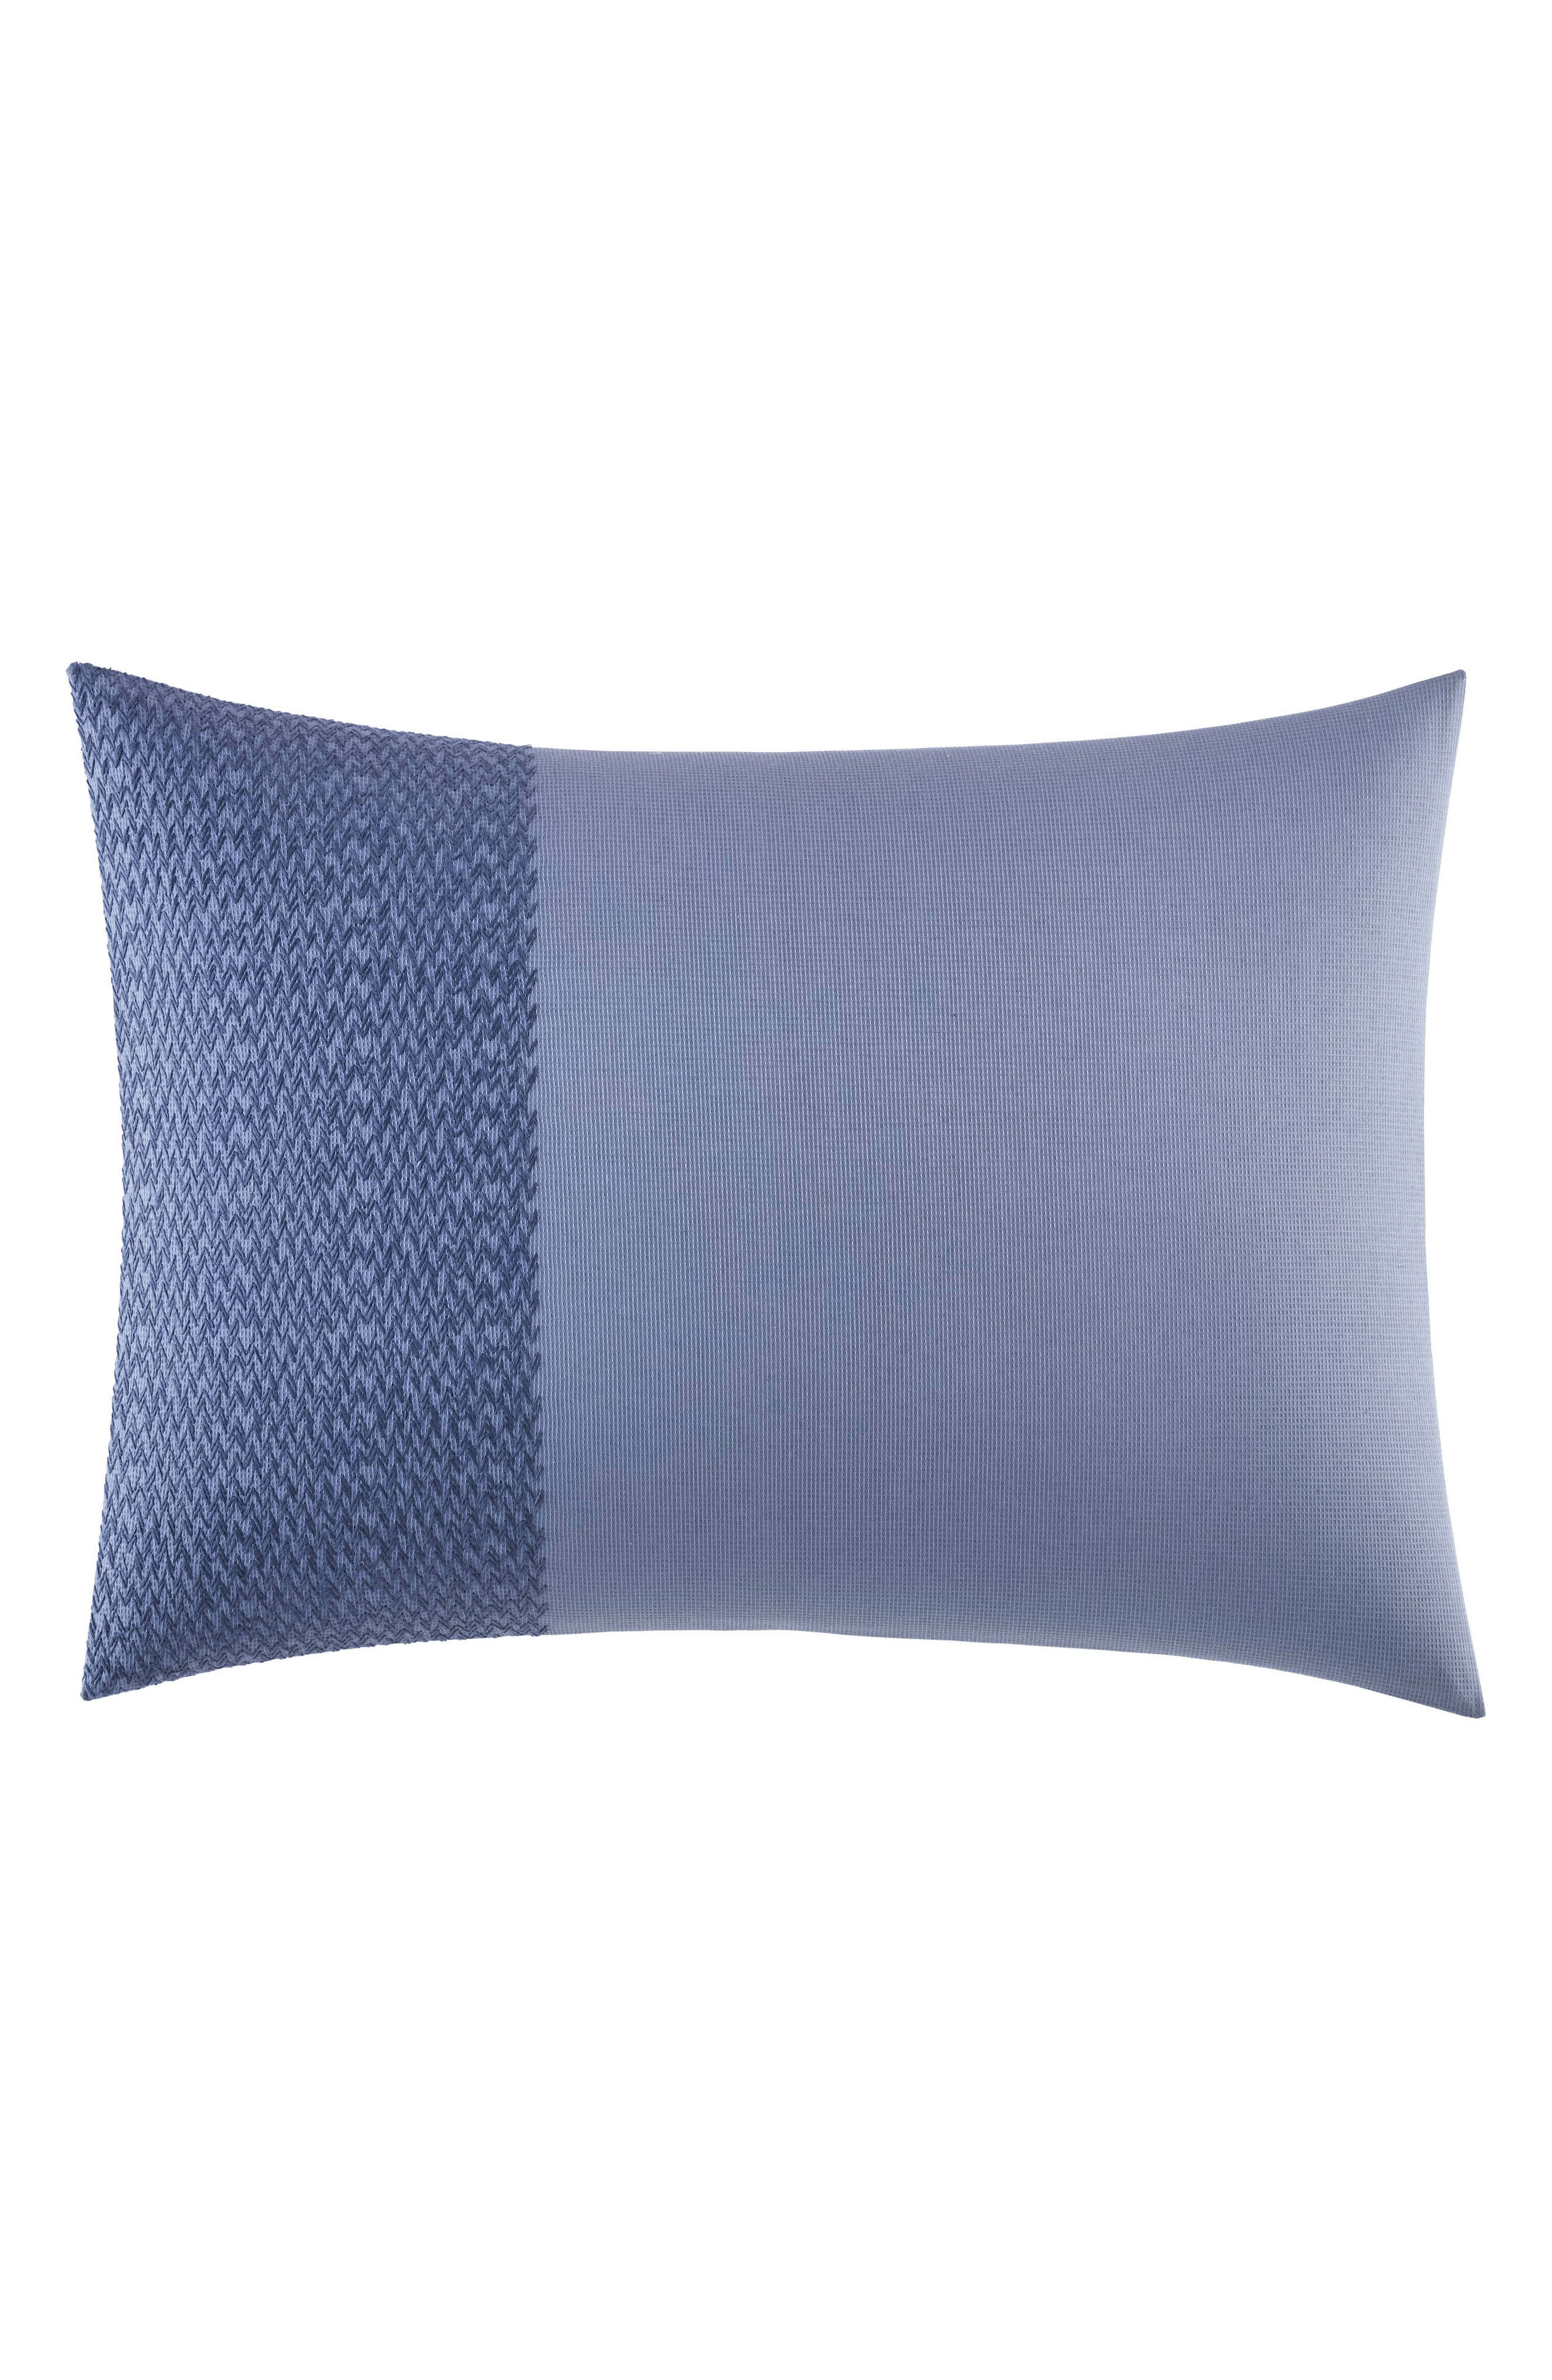 Chevron Breakfast Pillow,                         Main,                         color, 500